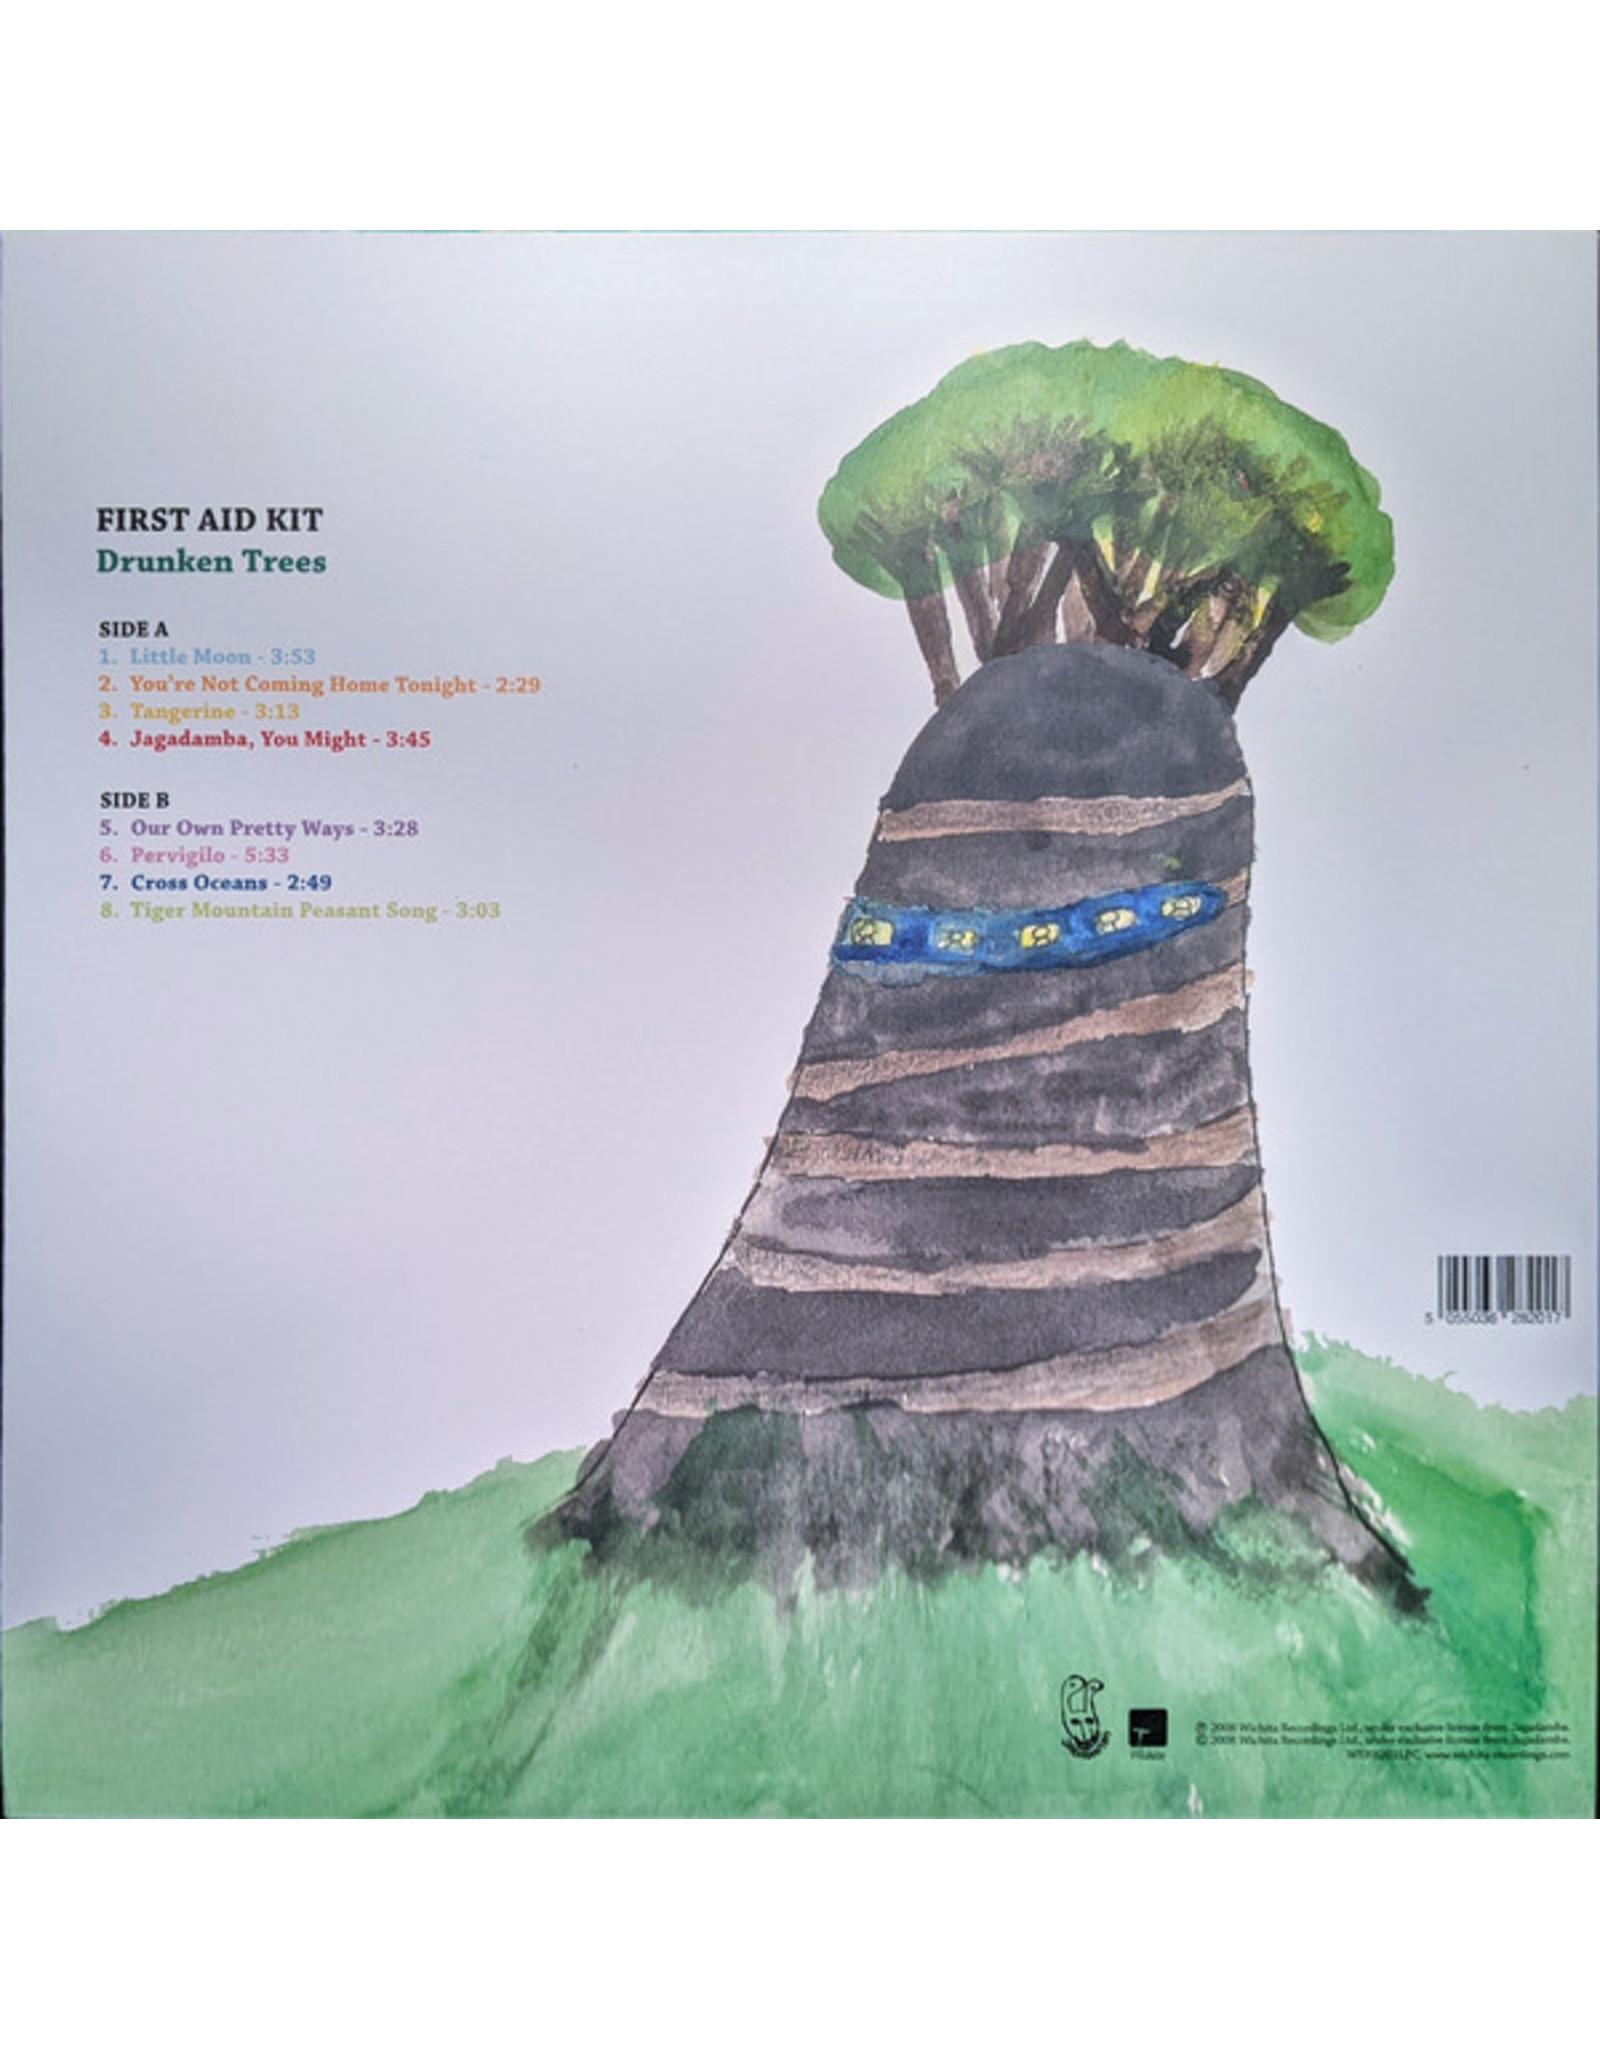 First Aid Kit - Drunken Trees EP (Exclusive Yellow Vinyl)